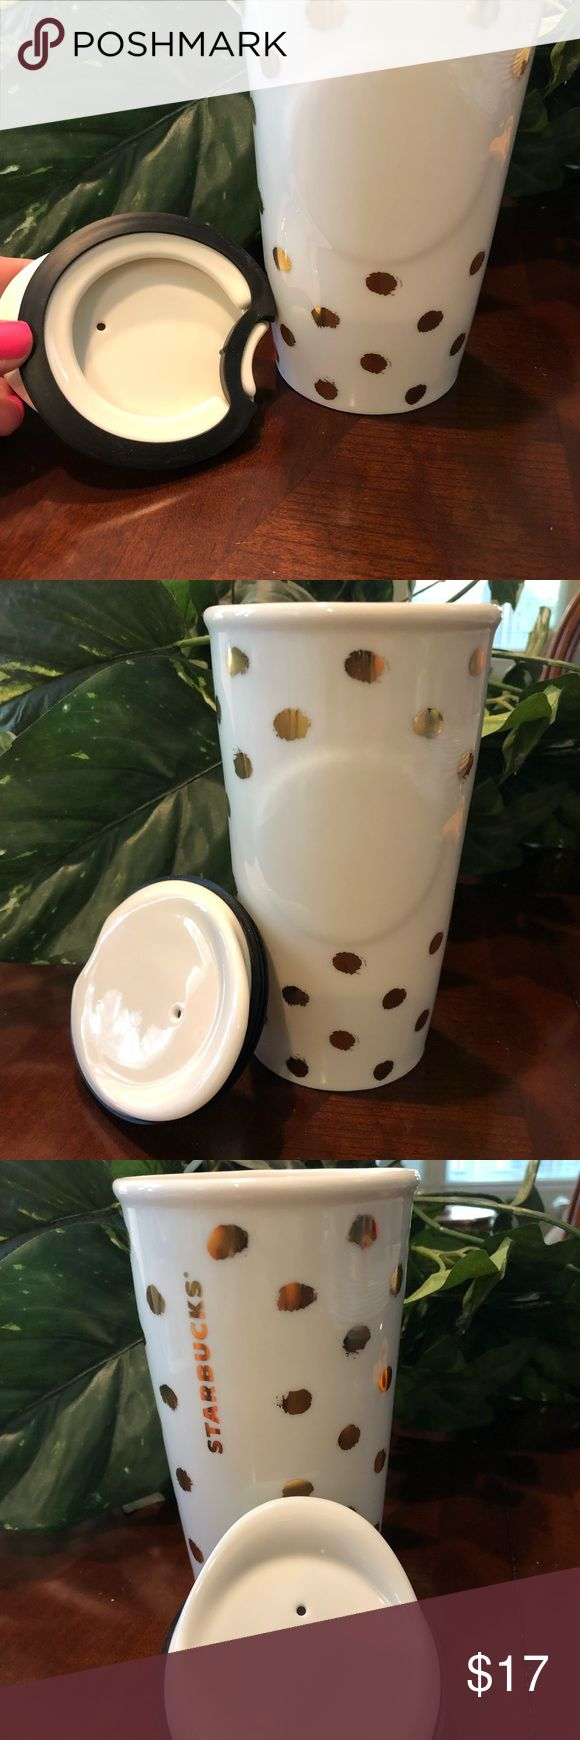 Starbucks cup Ceramic Starbucks cup with ceramic lid to